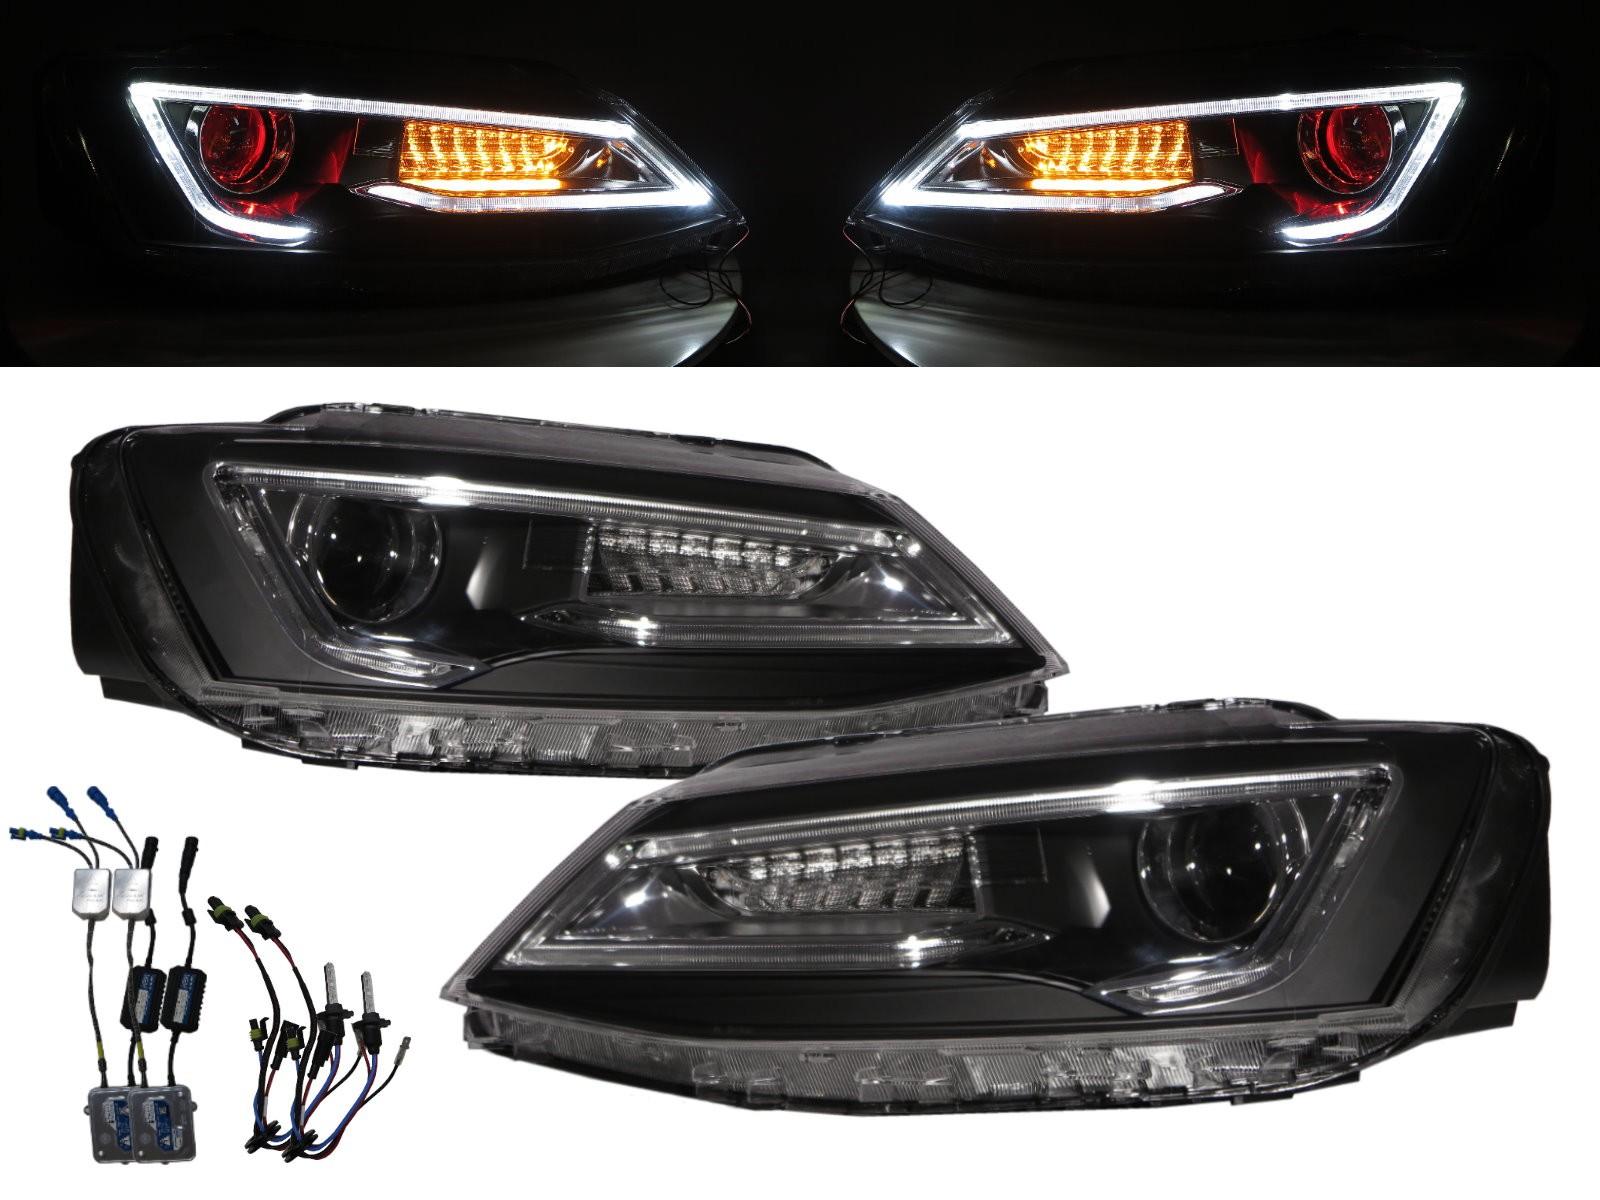 CrazyTheGod JETTA A6 1B Sixth generation 2011-2016 Sedan 4D LED Bar Halogen Headlight Headlamp Black for VW Volkswagen LHD